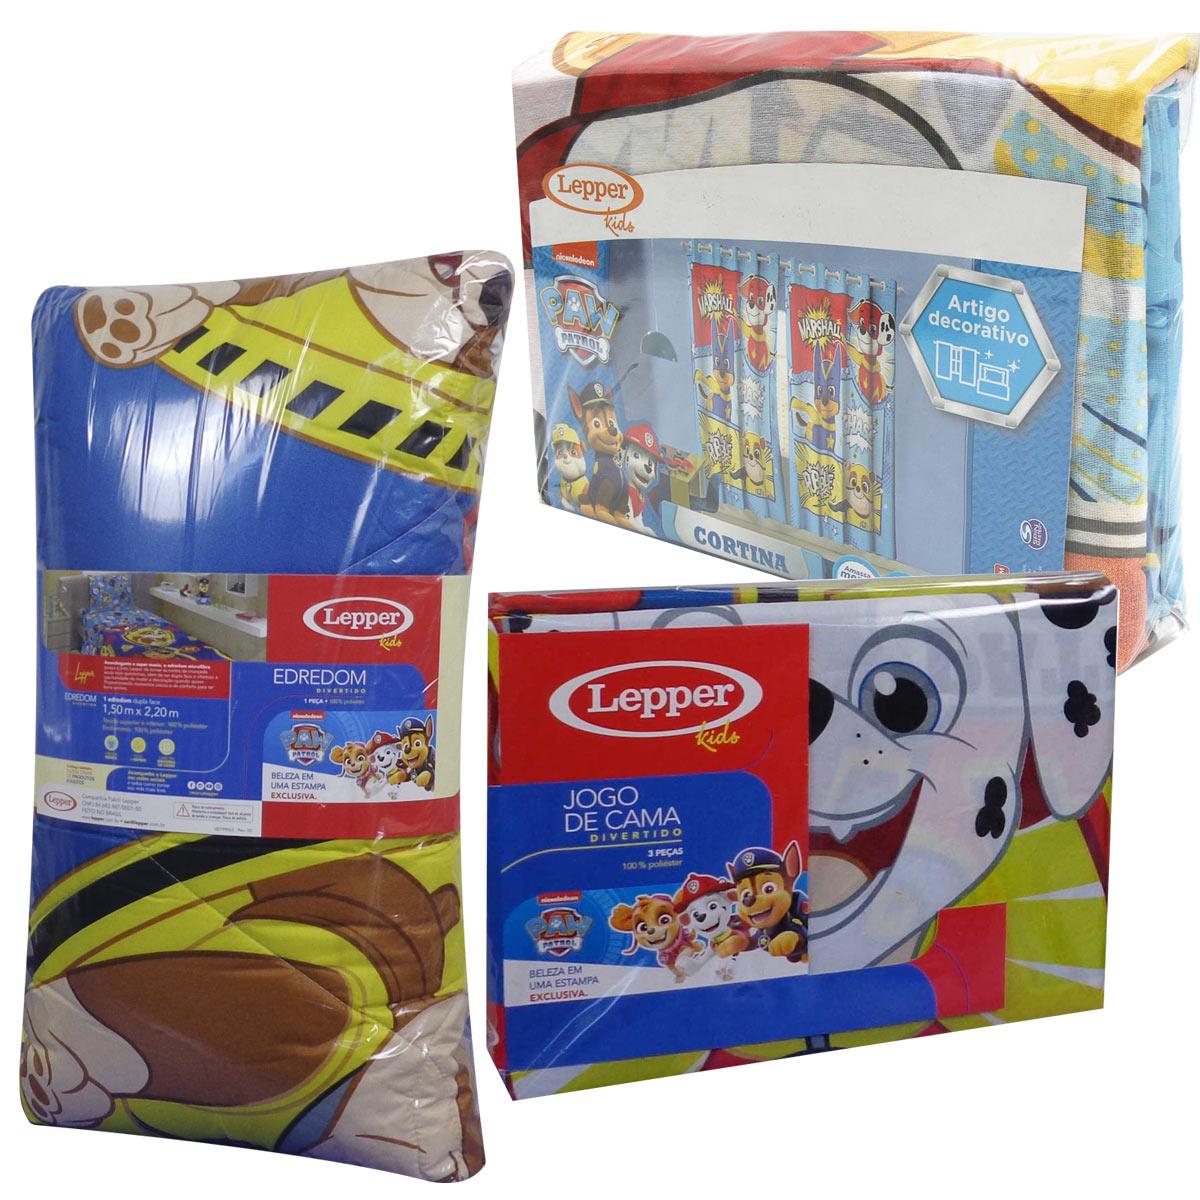 Kit Infantil Patrulha Canina Cortina + Jogo De Lençol + Edredom Lepper